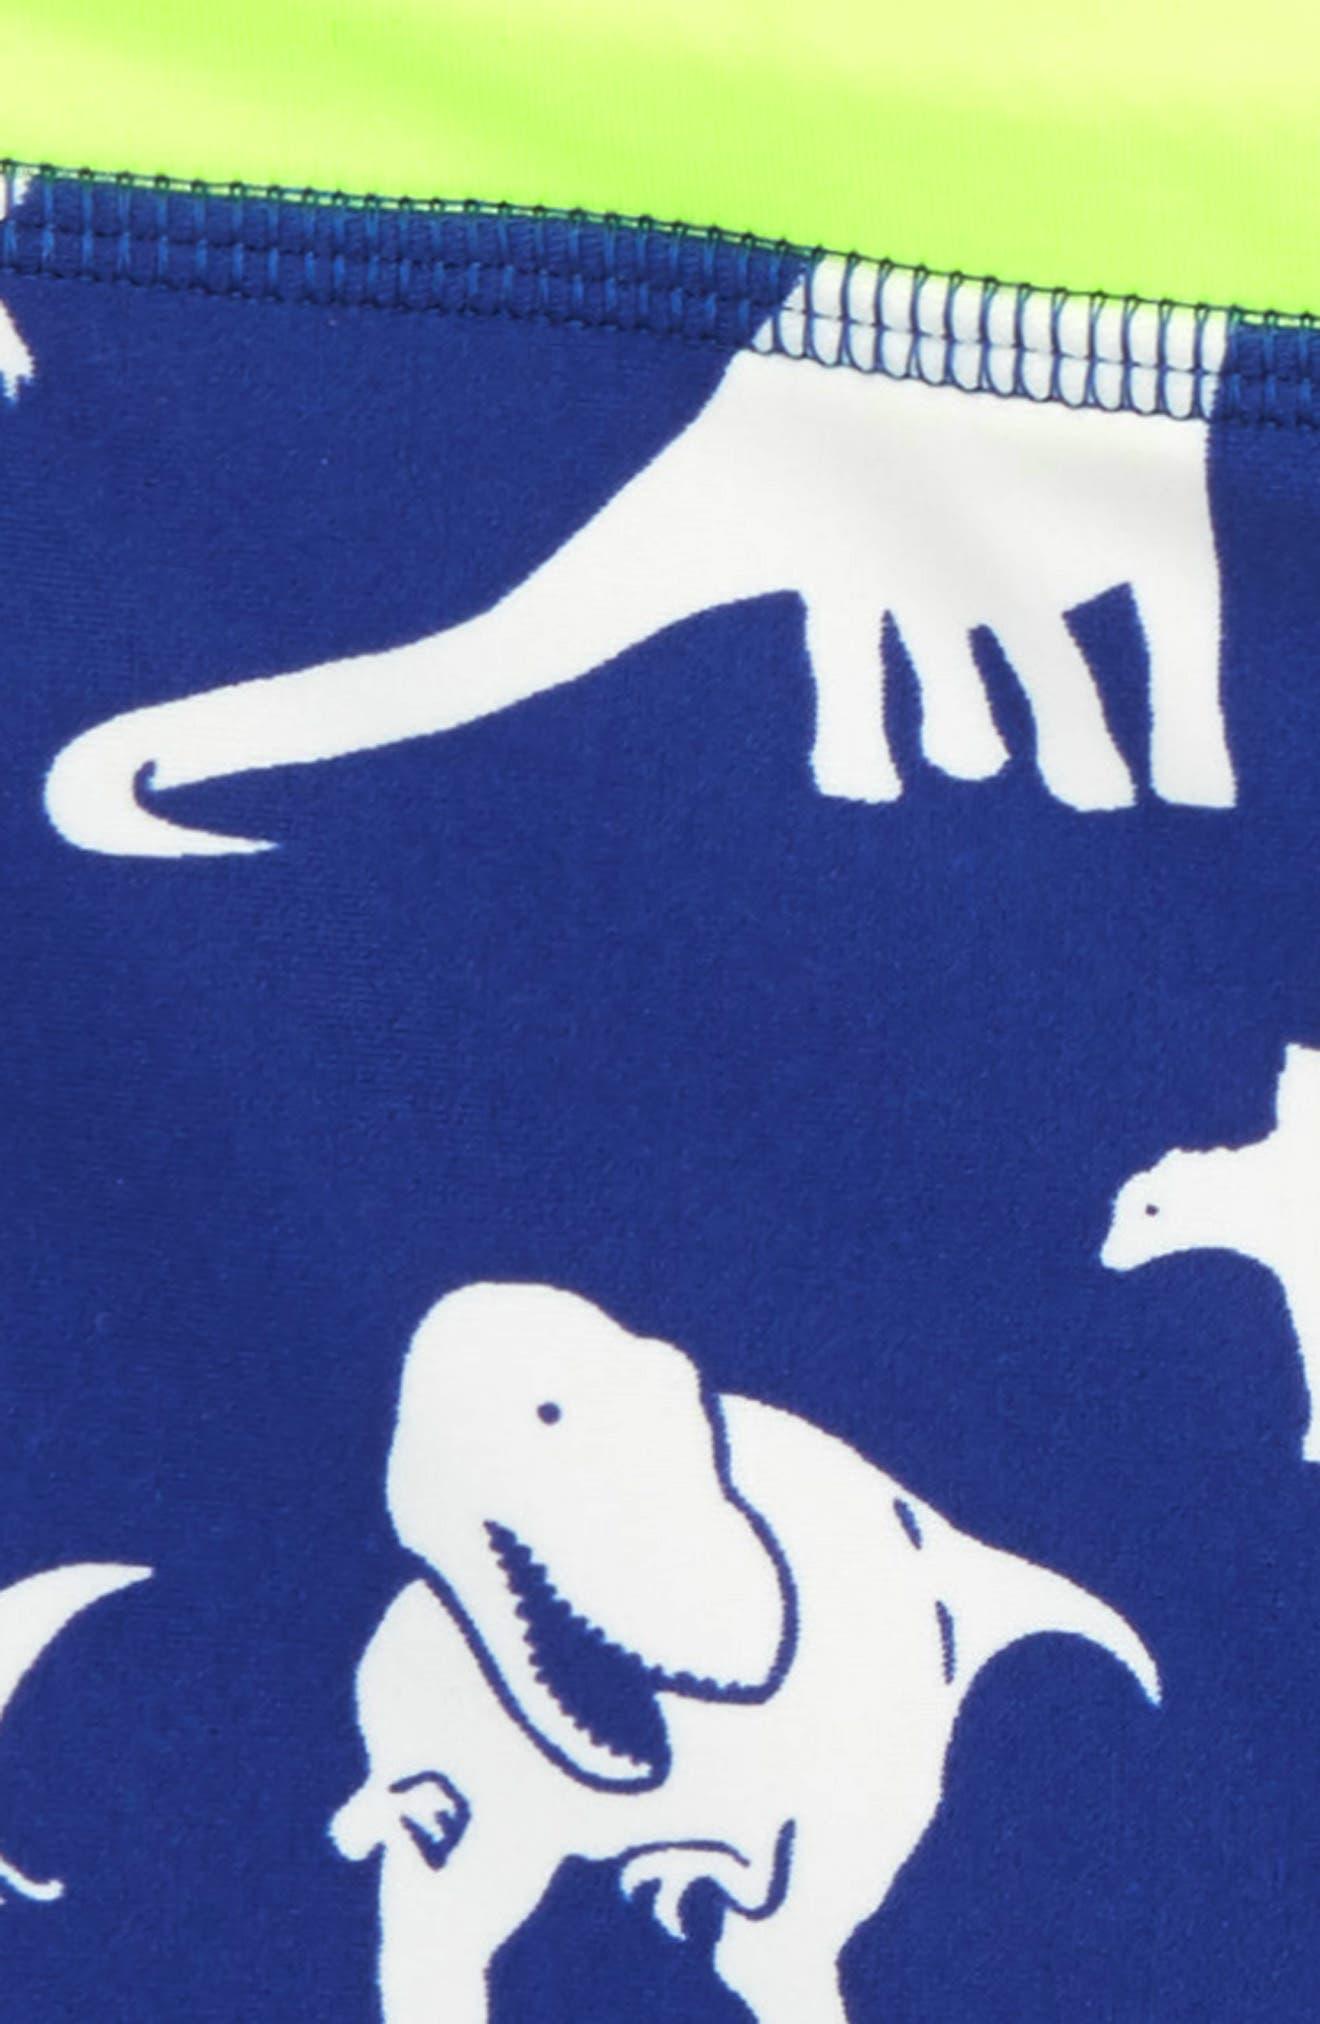 Dino Swim Trunks,                             Alternate thumbnail 2, color,                             Royal Blue Roarsome Friends